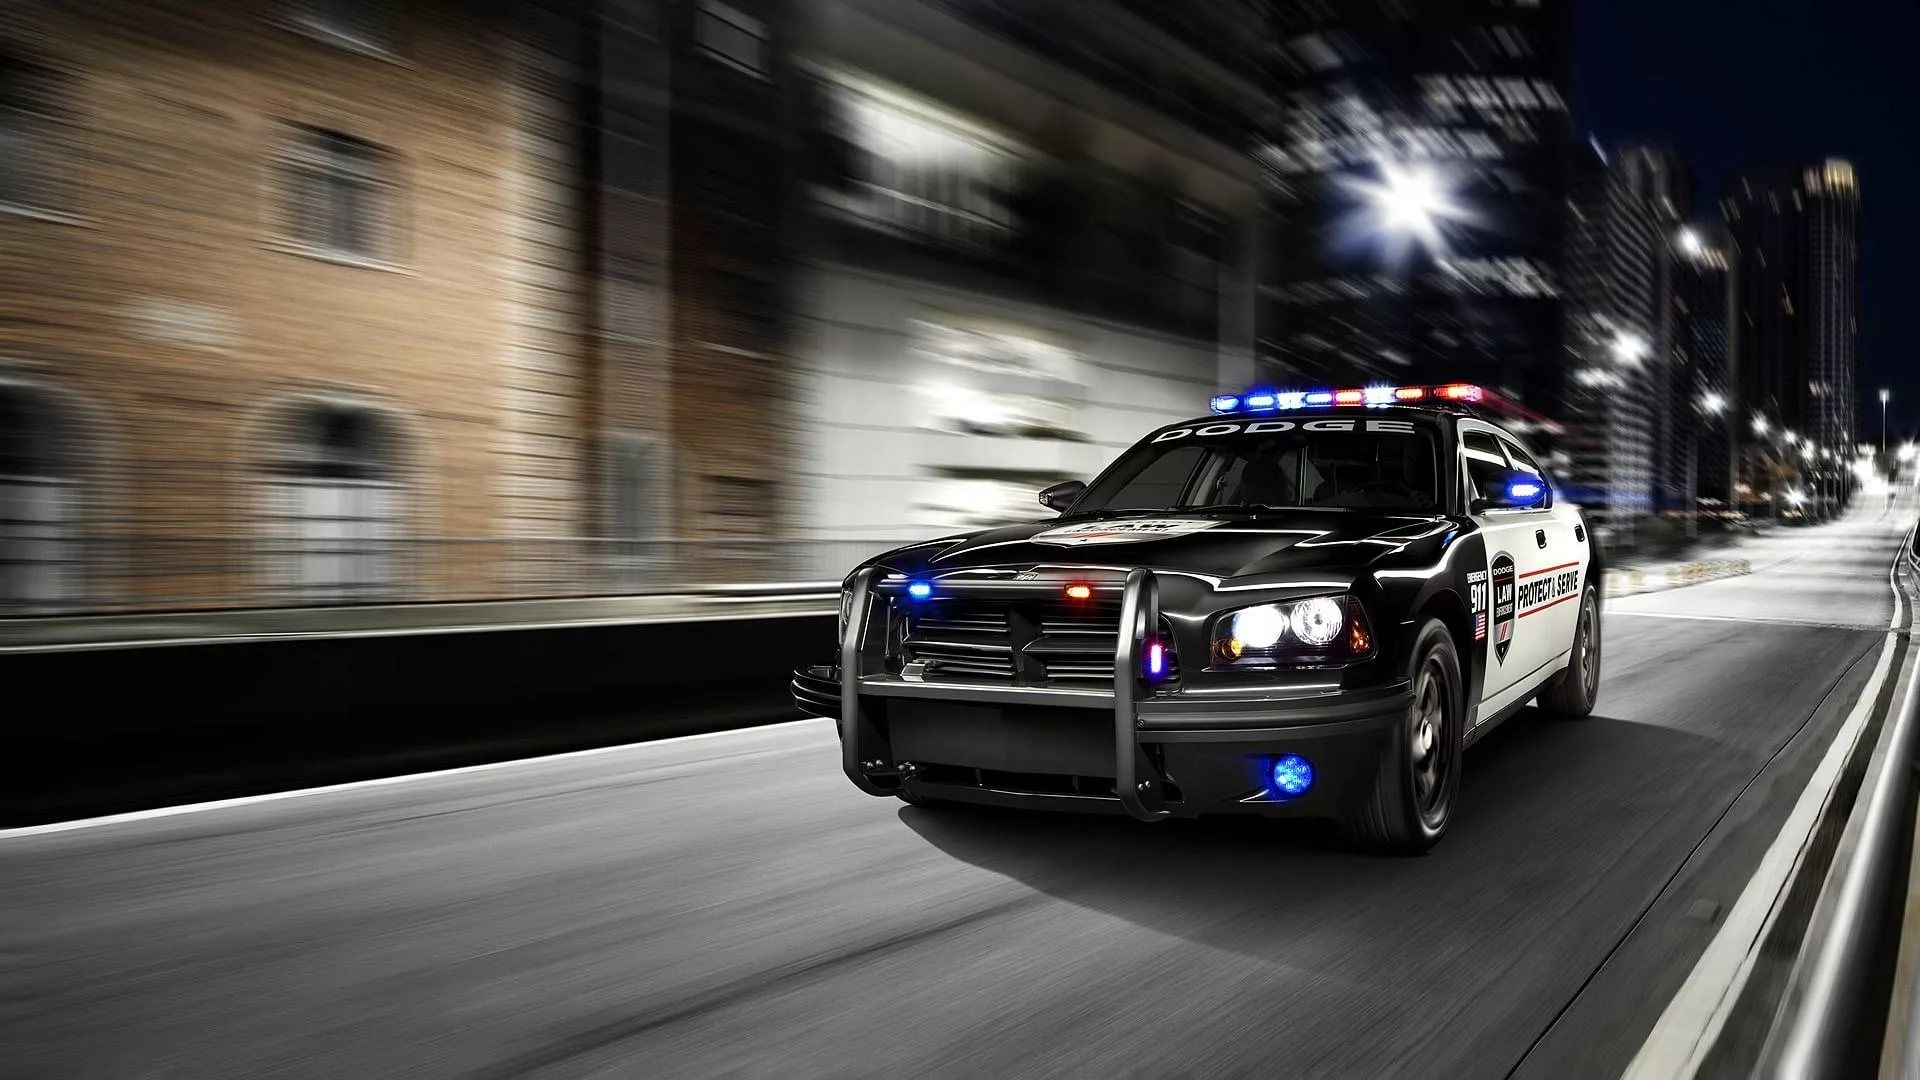 Police Wallpaper Image